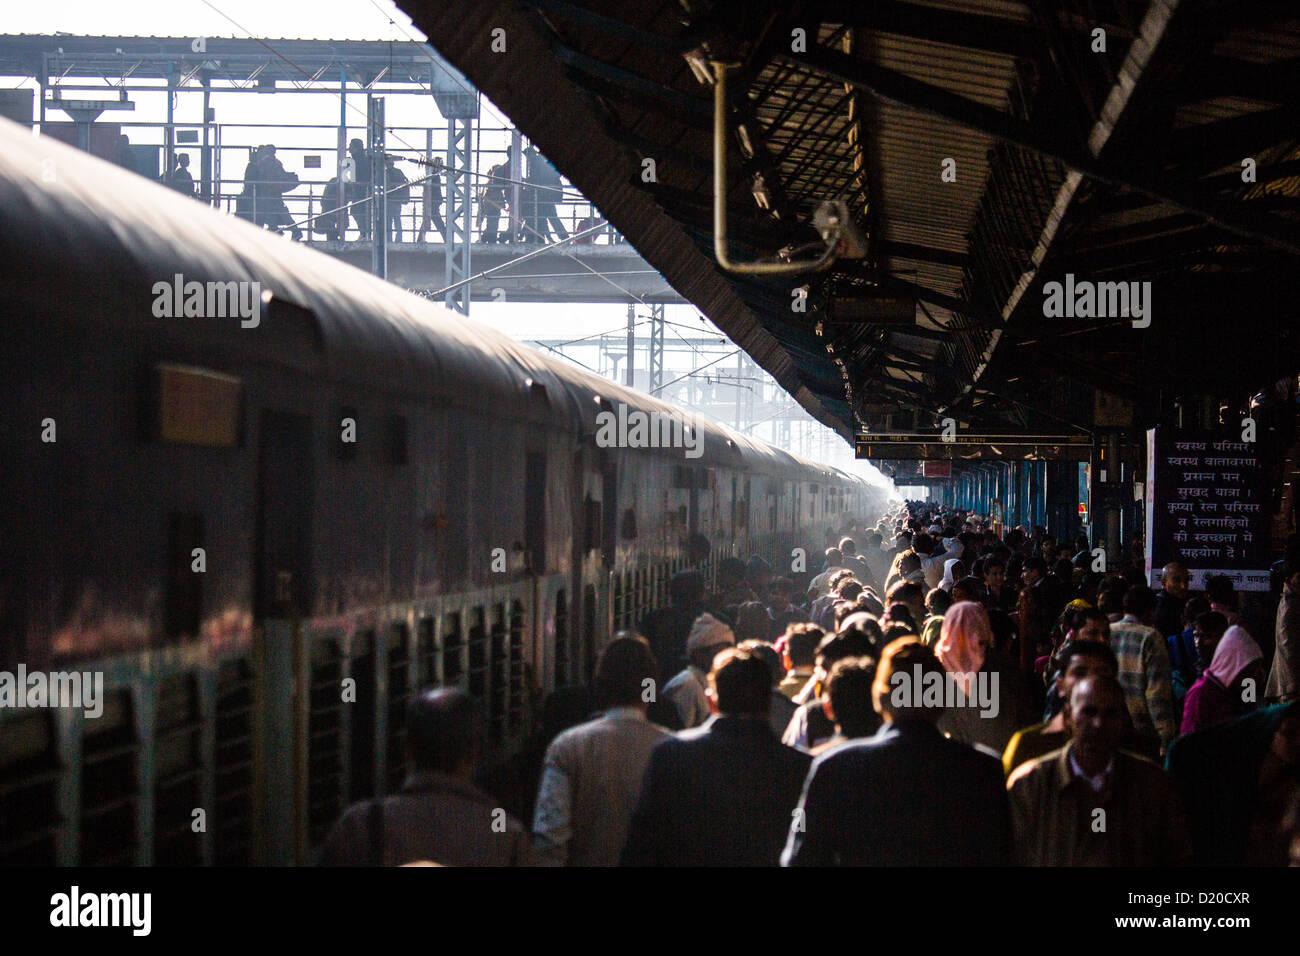 New Delhi Raliway Station, New Delhi, India - Stock Image